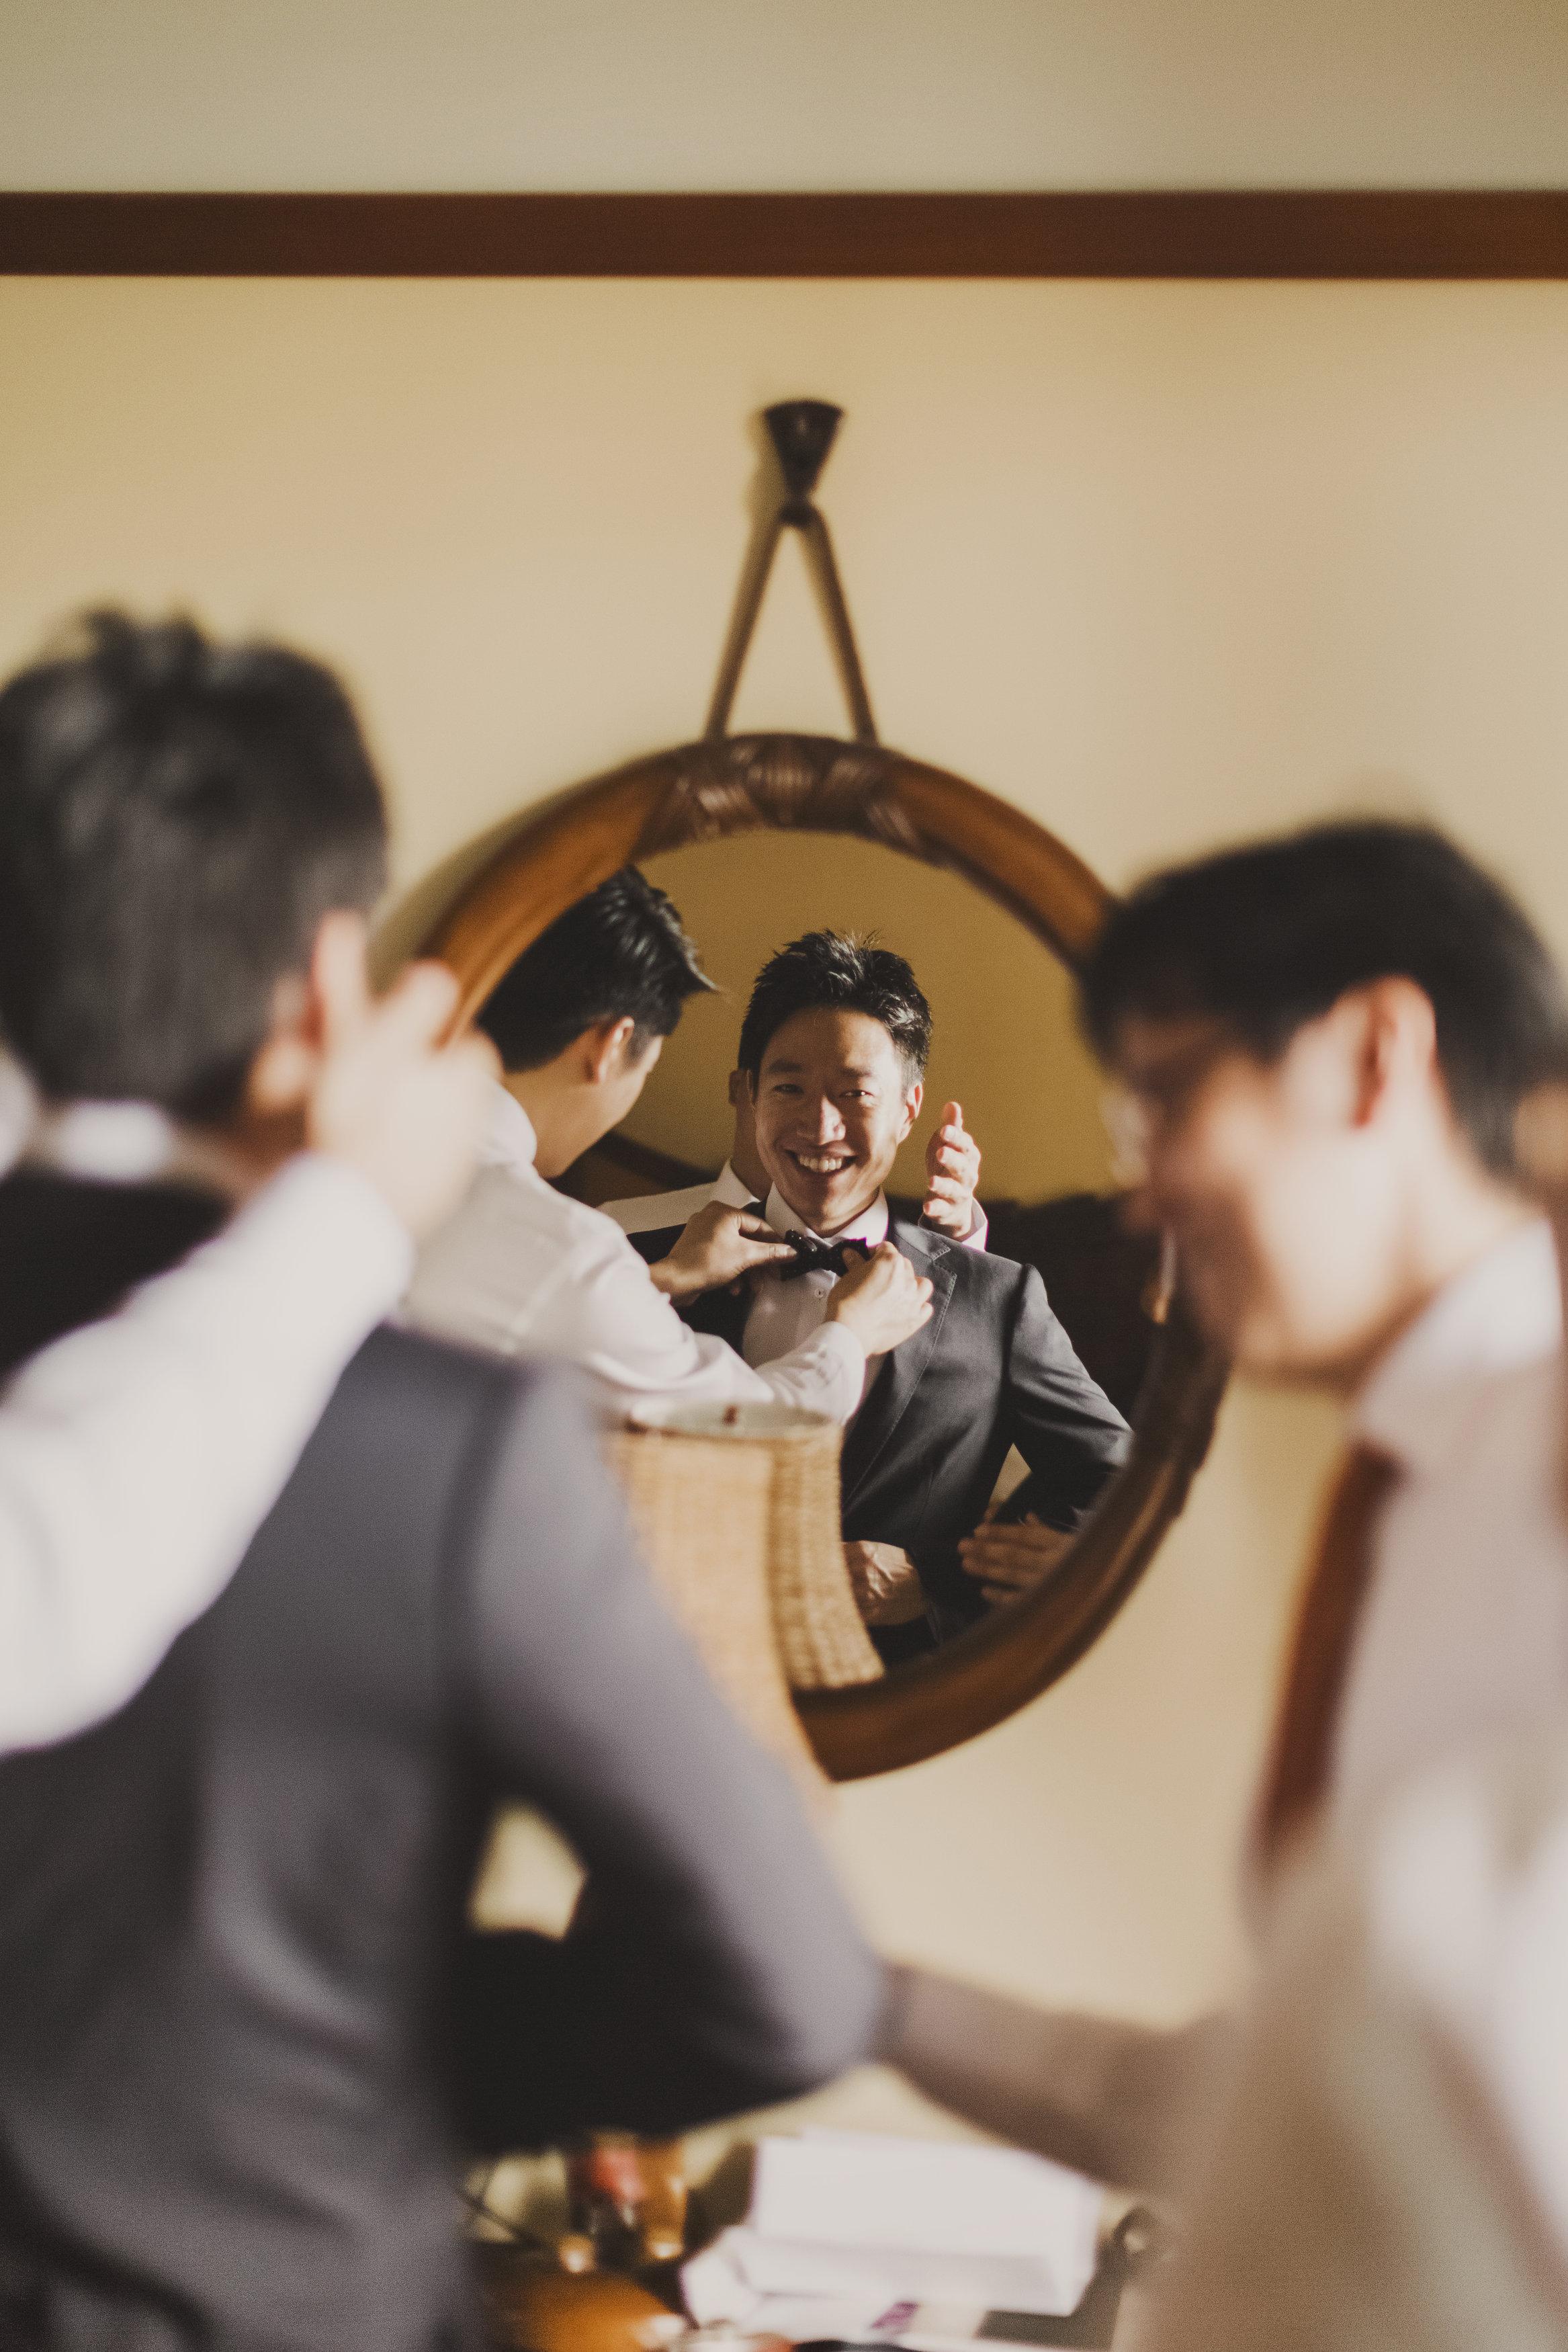 angie-diaz-photography-oahu-wedding-lanikuhonoa-shenshen-marshall-17.jpg